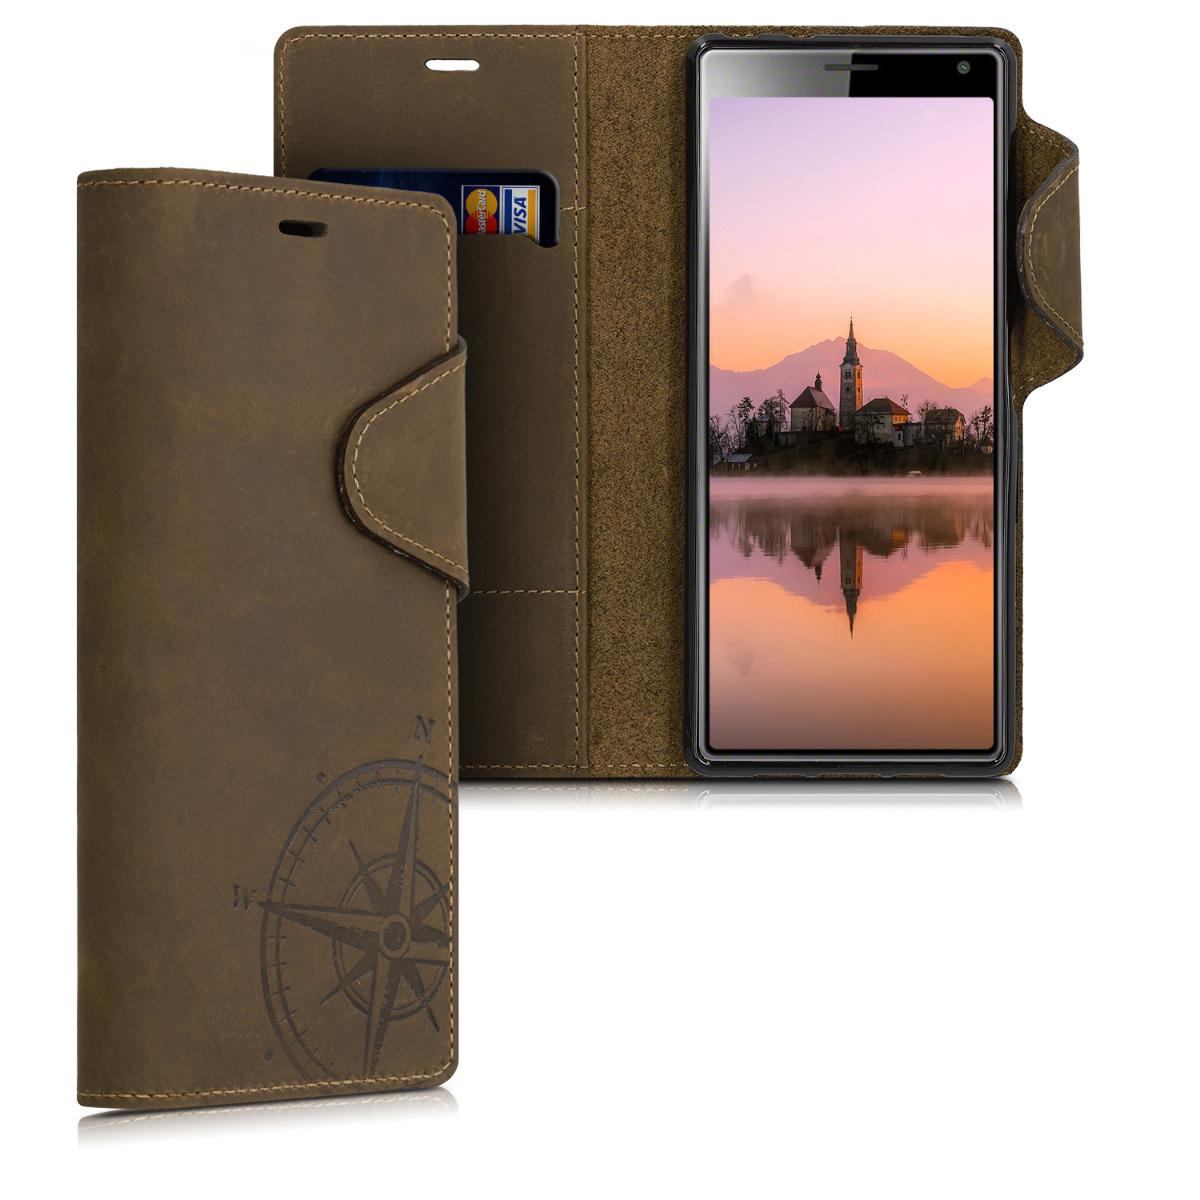 Kalibri Δερμάτινη Suede Θήκη - Πορτοφόλι Sony Xperia 10 - Brown (48773.01)